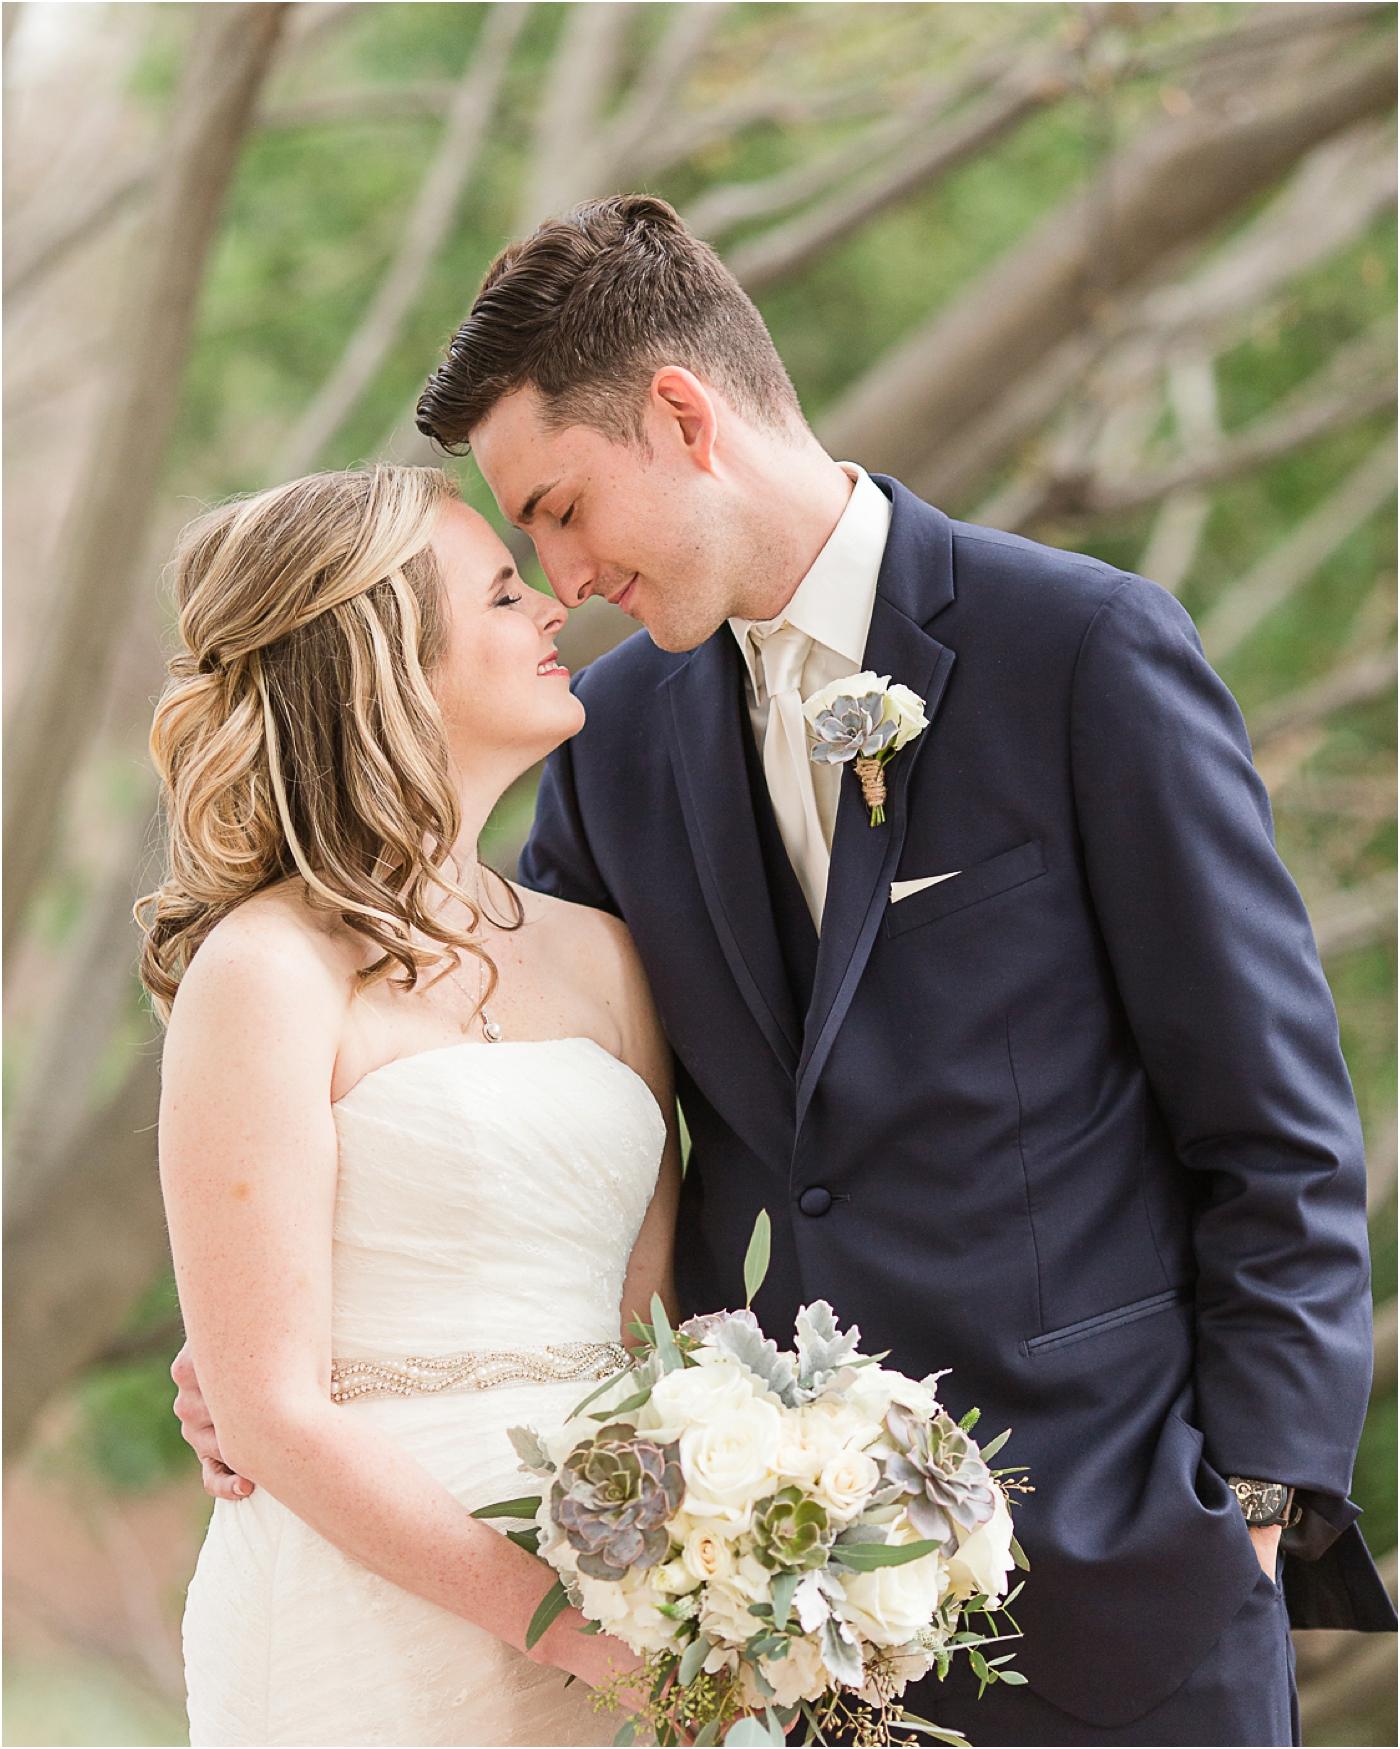 Greyrock-mansion-wedding-50.jpg